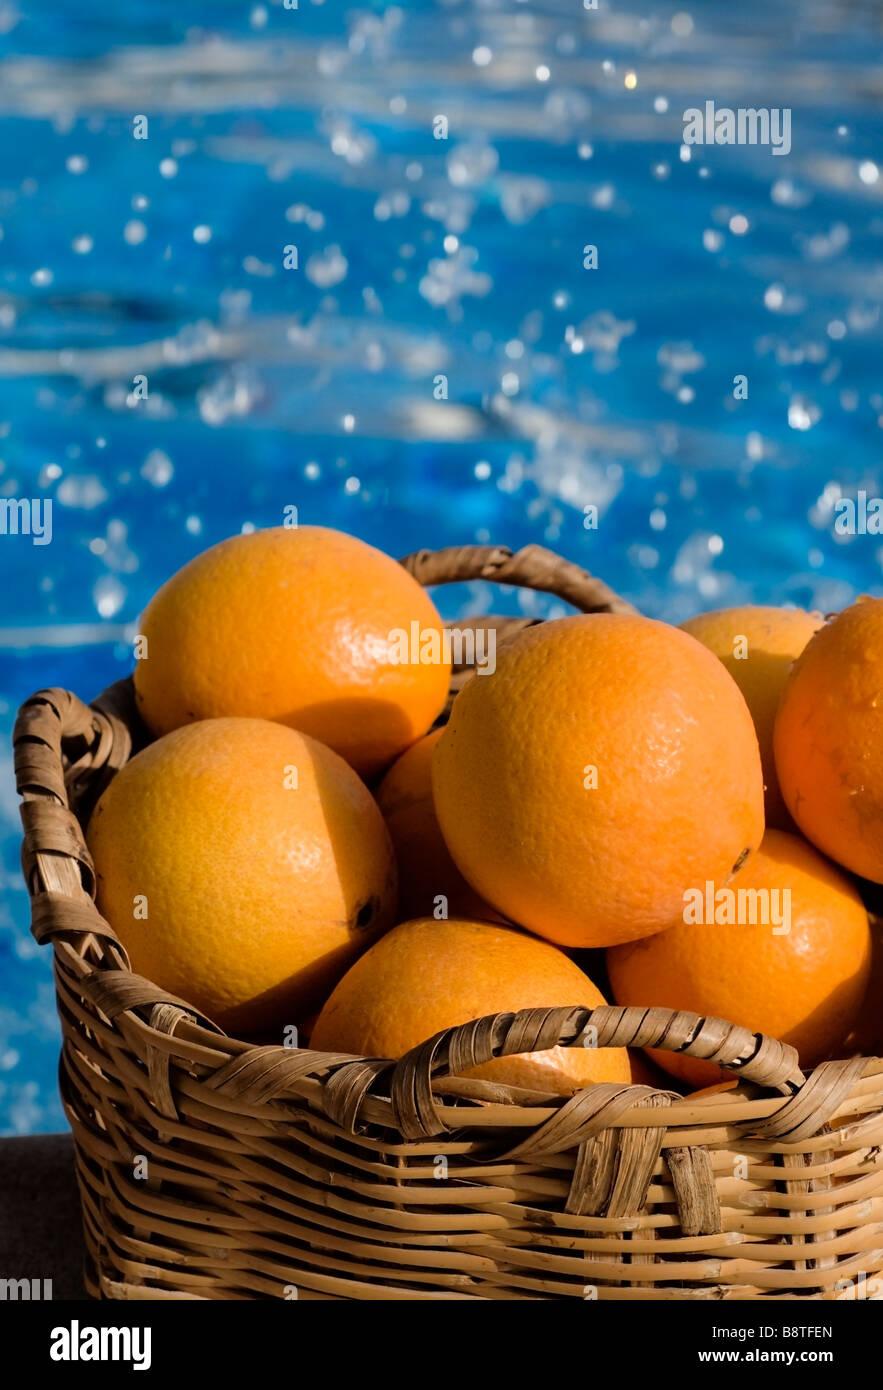 Basket of sunny Spanish oranges with swimming pool and splashing water behind - Stock Image